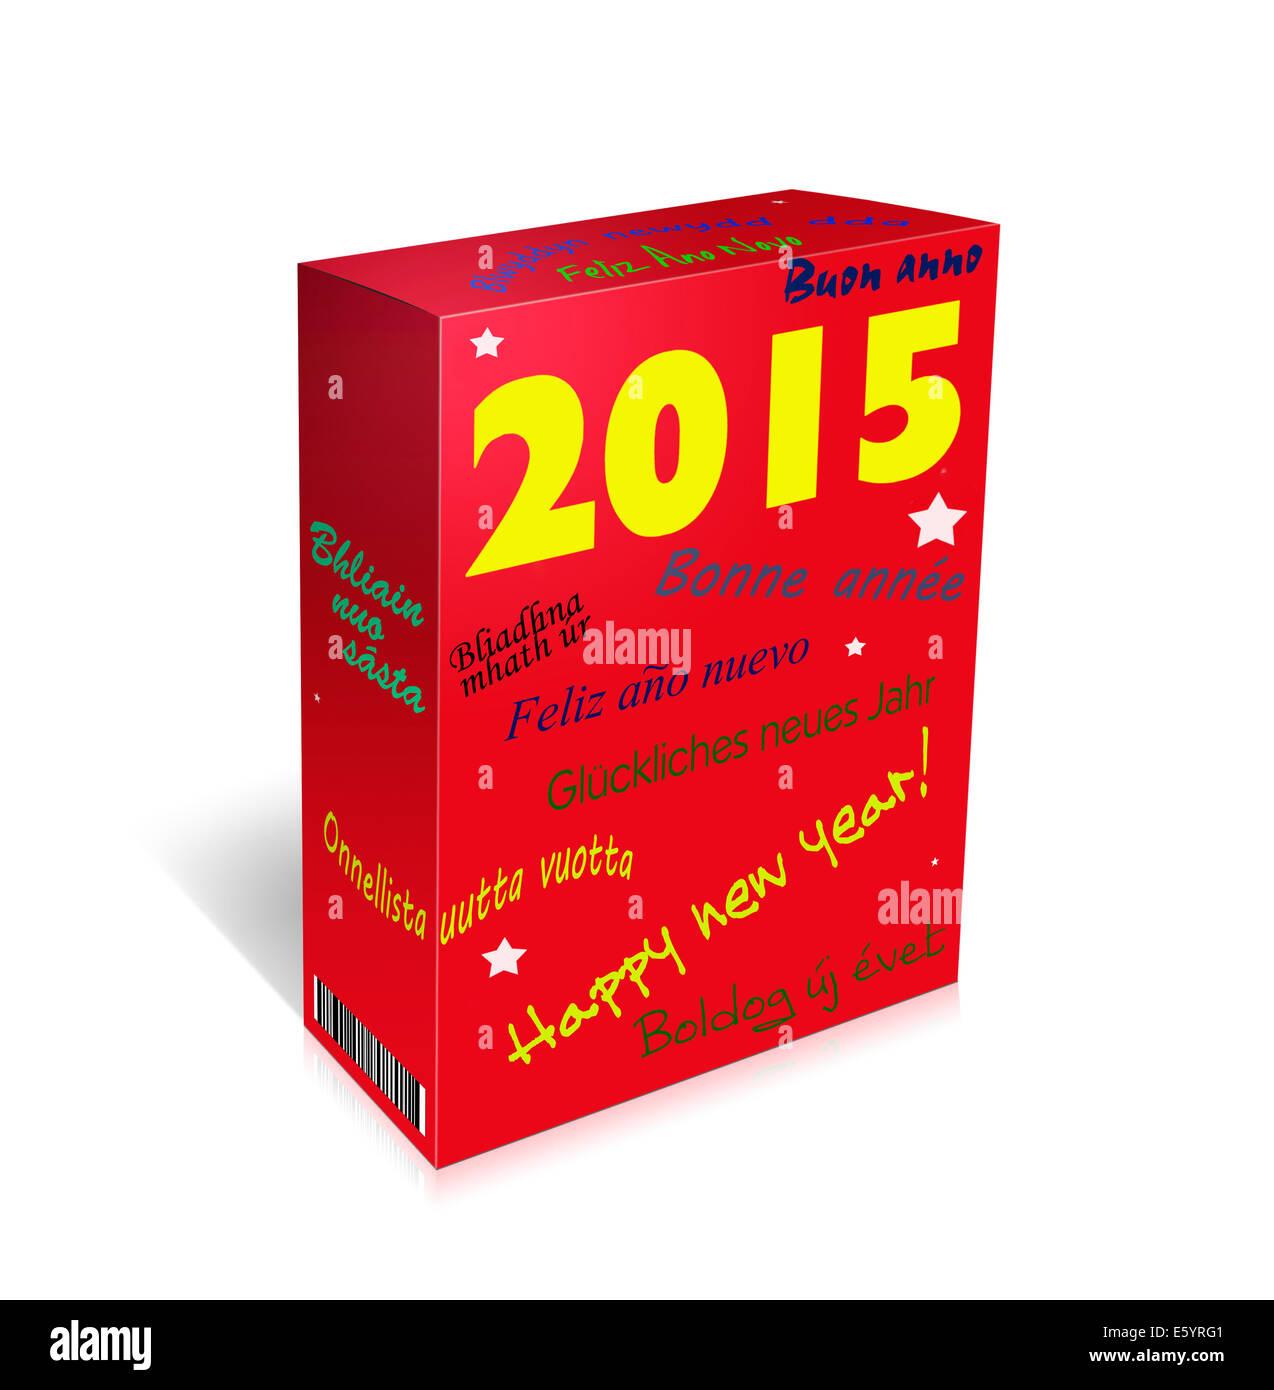 German new year greetings stock photos german new year greetings german new year greetings stock photos german new year greetings stock images alamy kristyandbryce Images